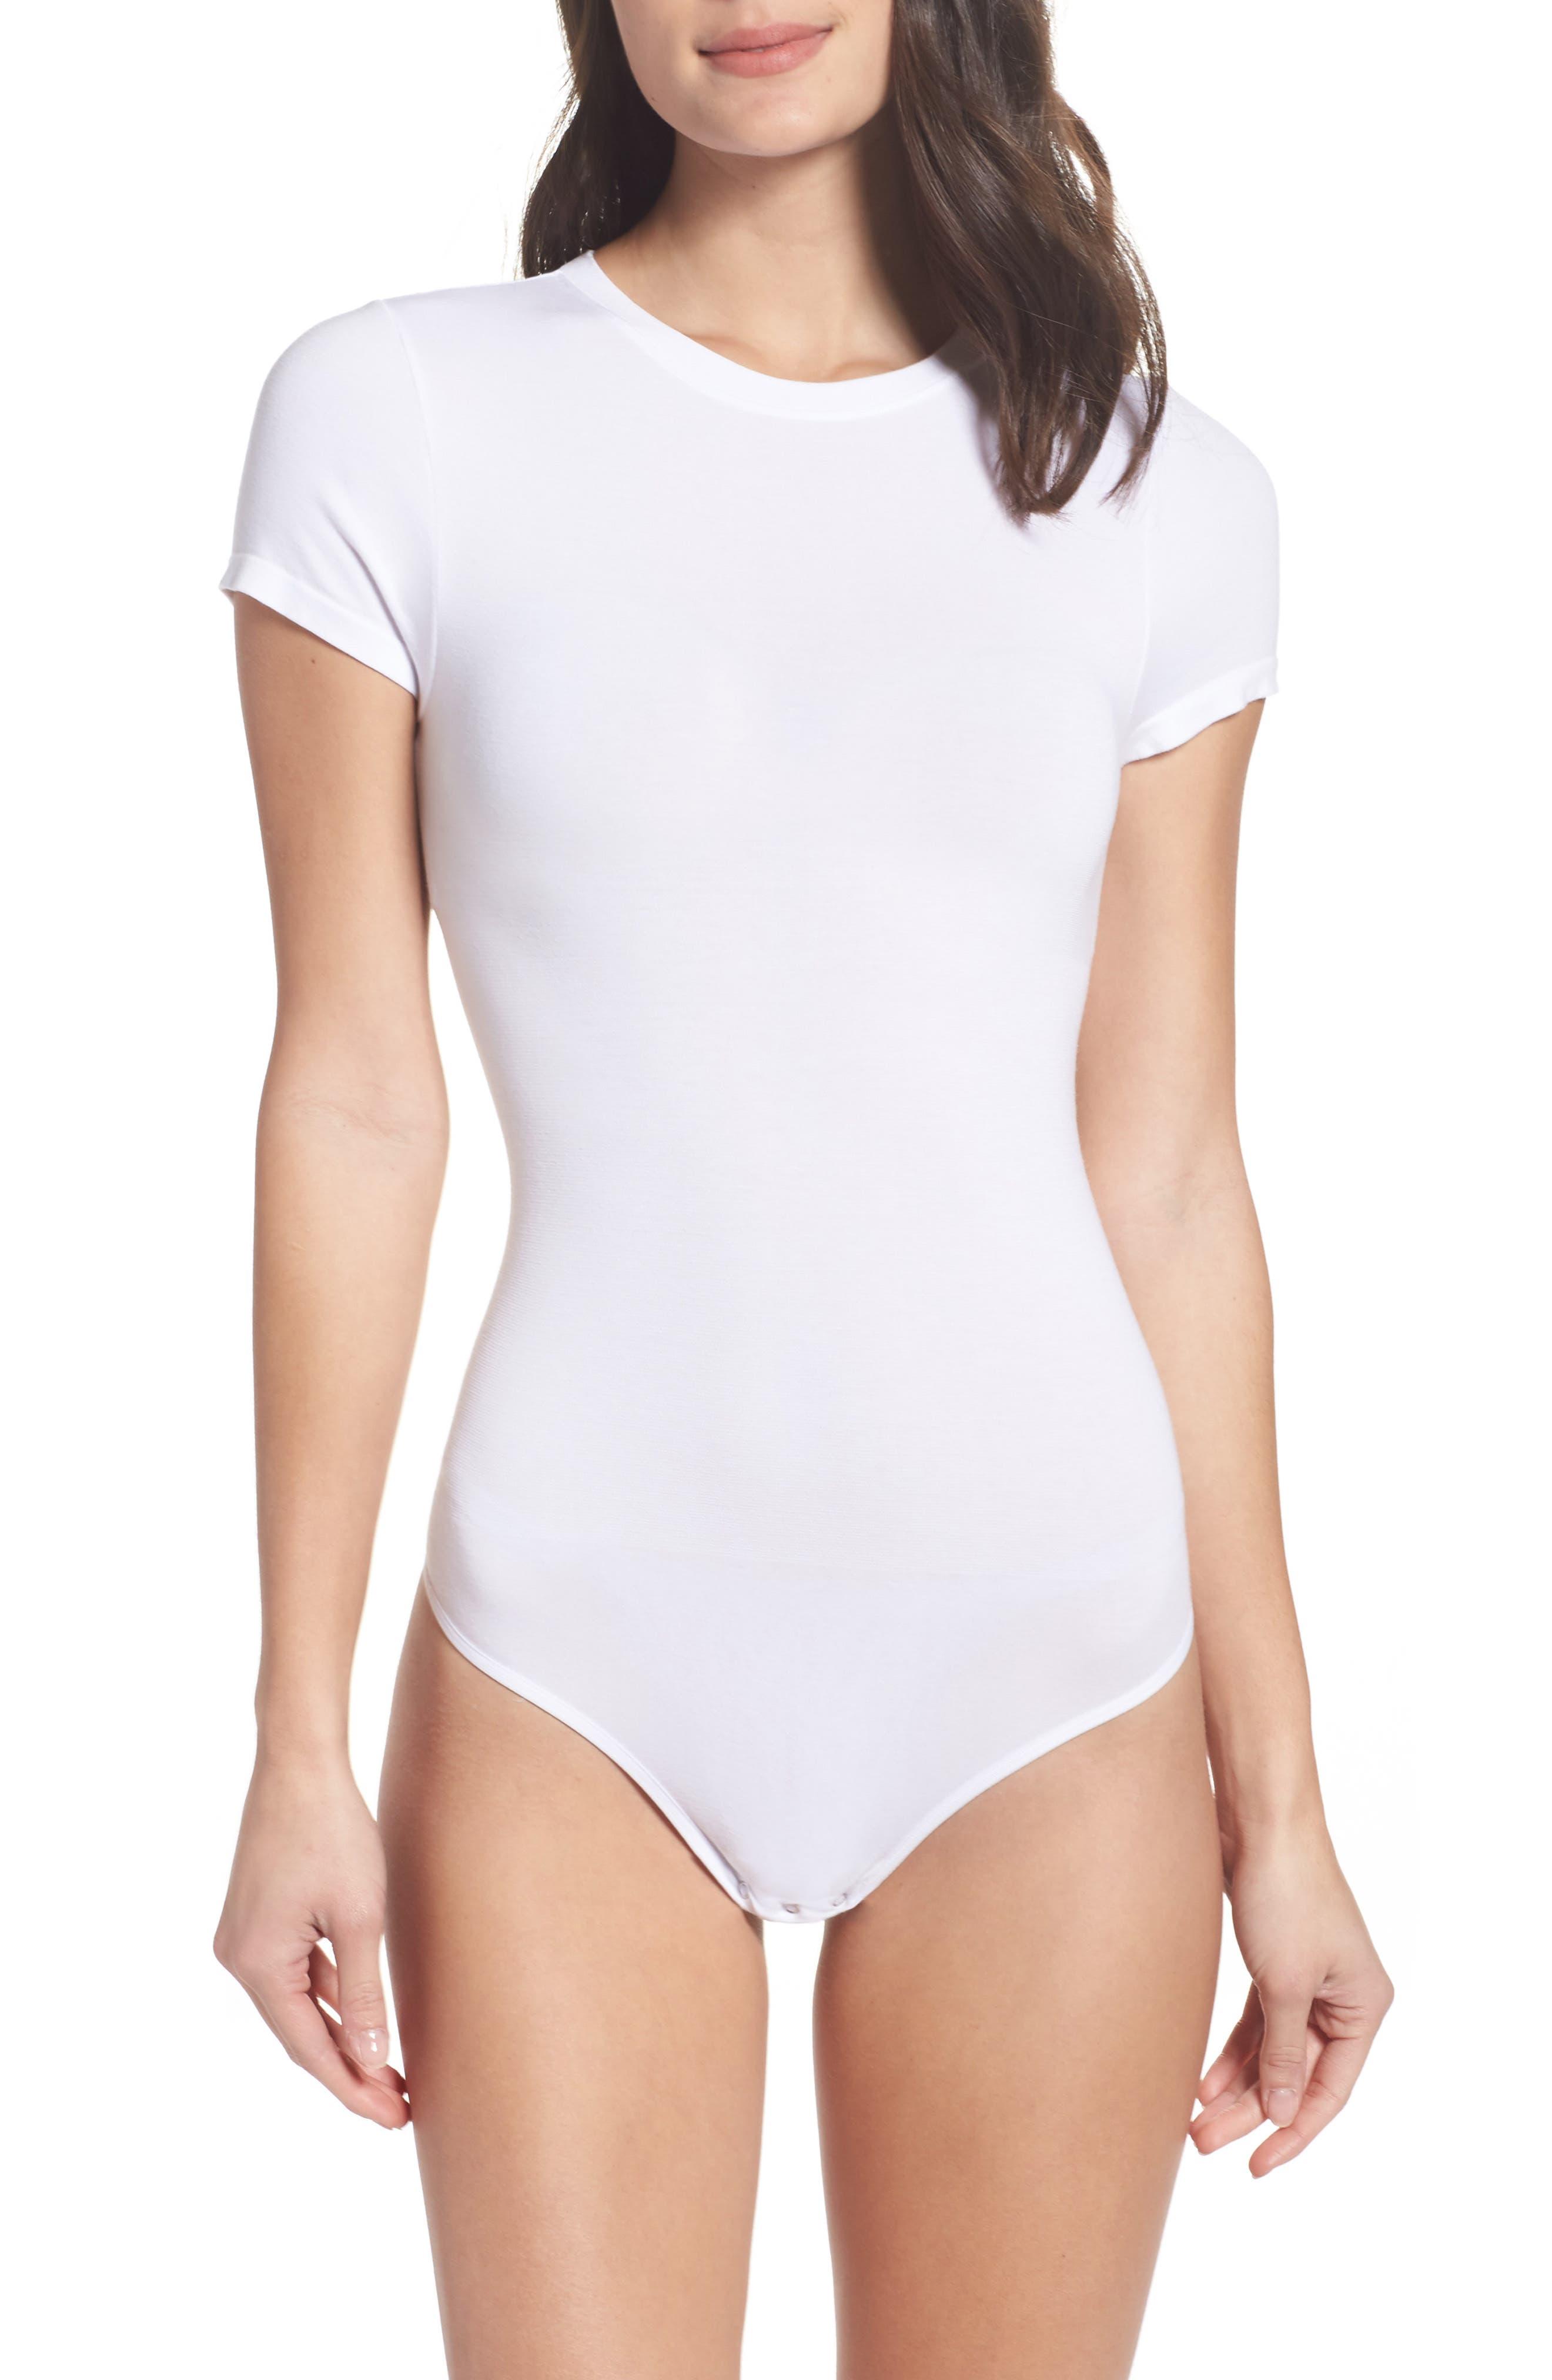 Thong Bodysuit,                             Main thumbnail 1, color,                             White